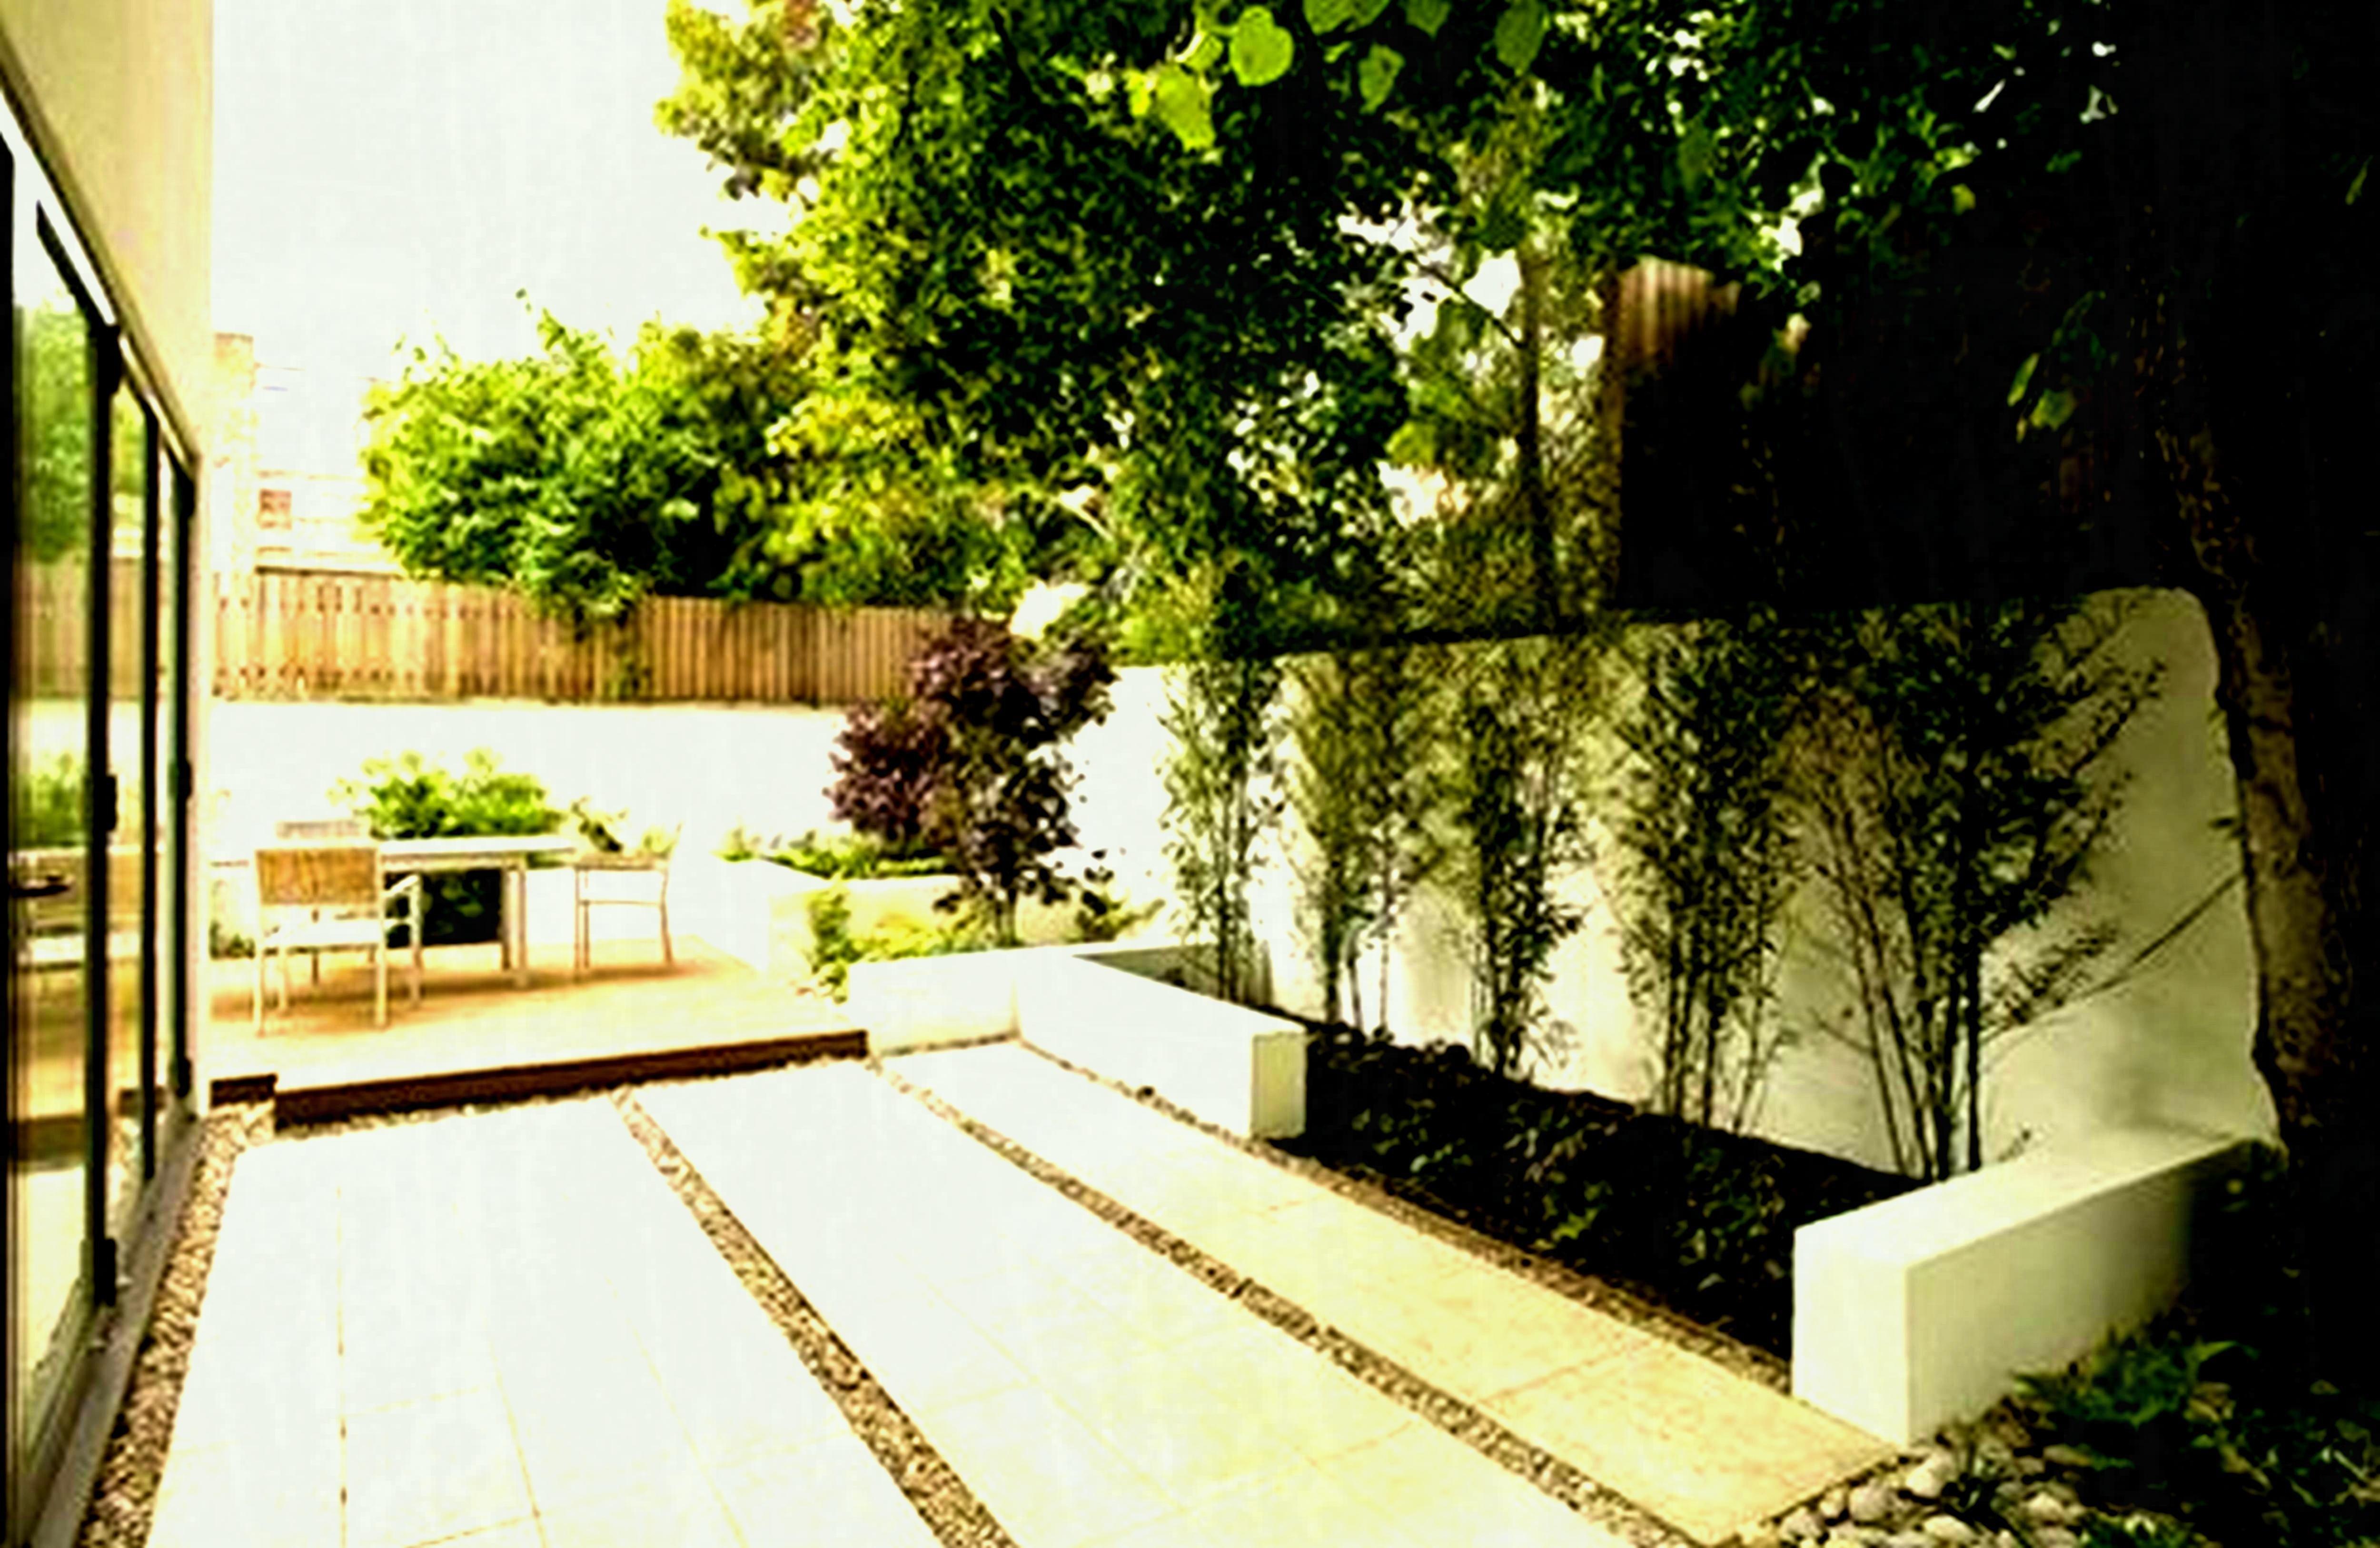 10 Nice Mid Century Modern Landscape Design Ideas mid century modern landscape design ideas stunning landscaping 2021